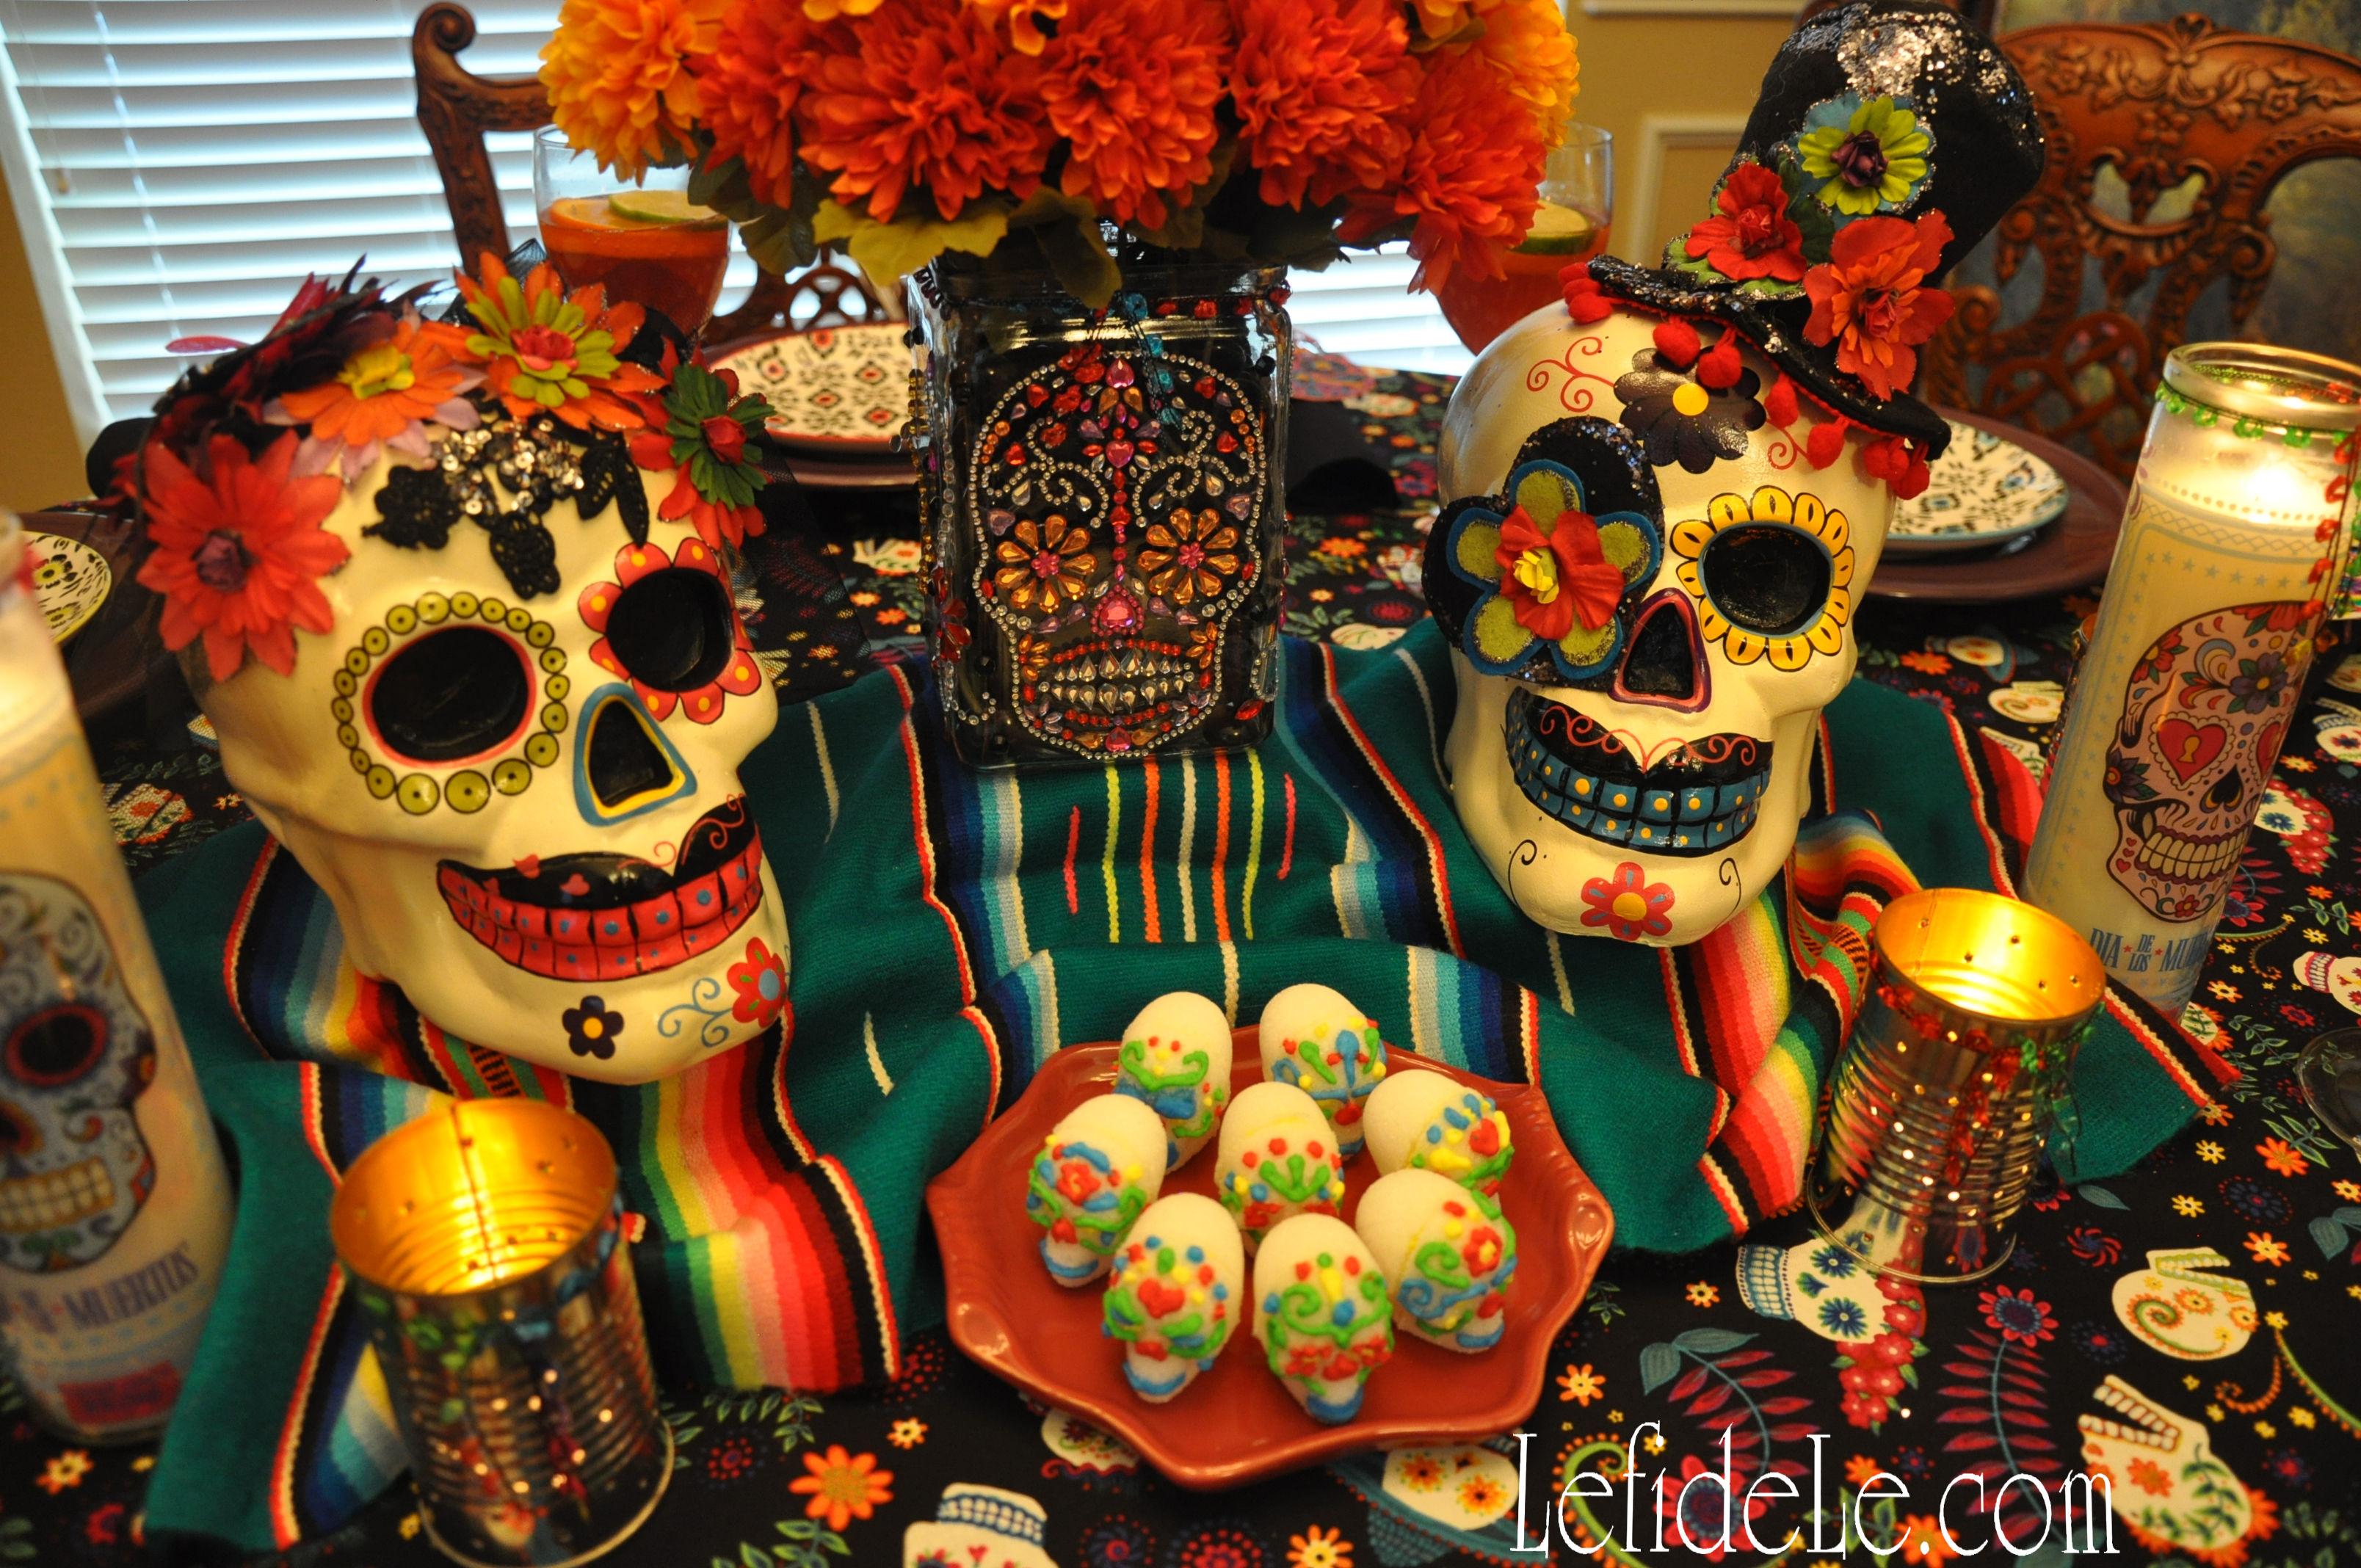 calaveras de azucar sugar skulls edible folk art egg free vegan